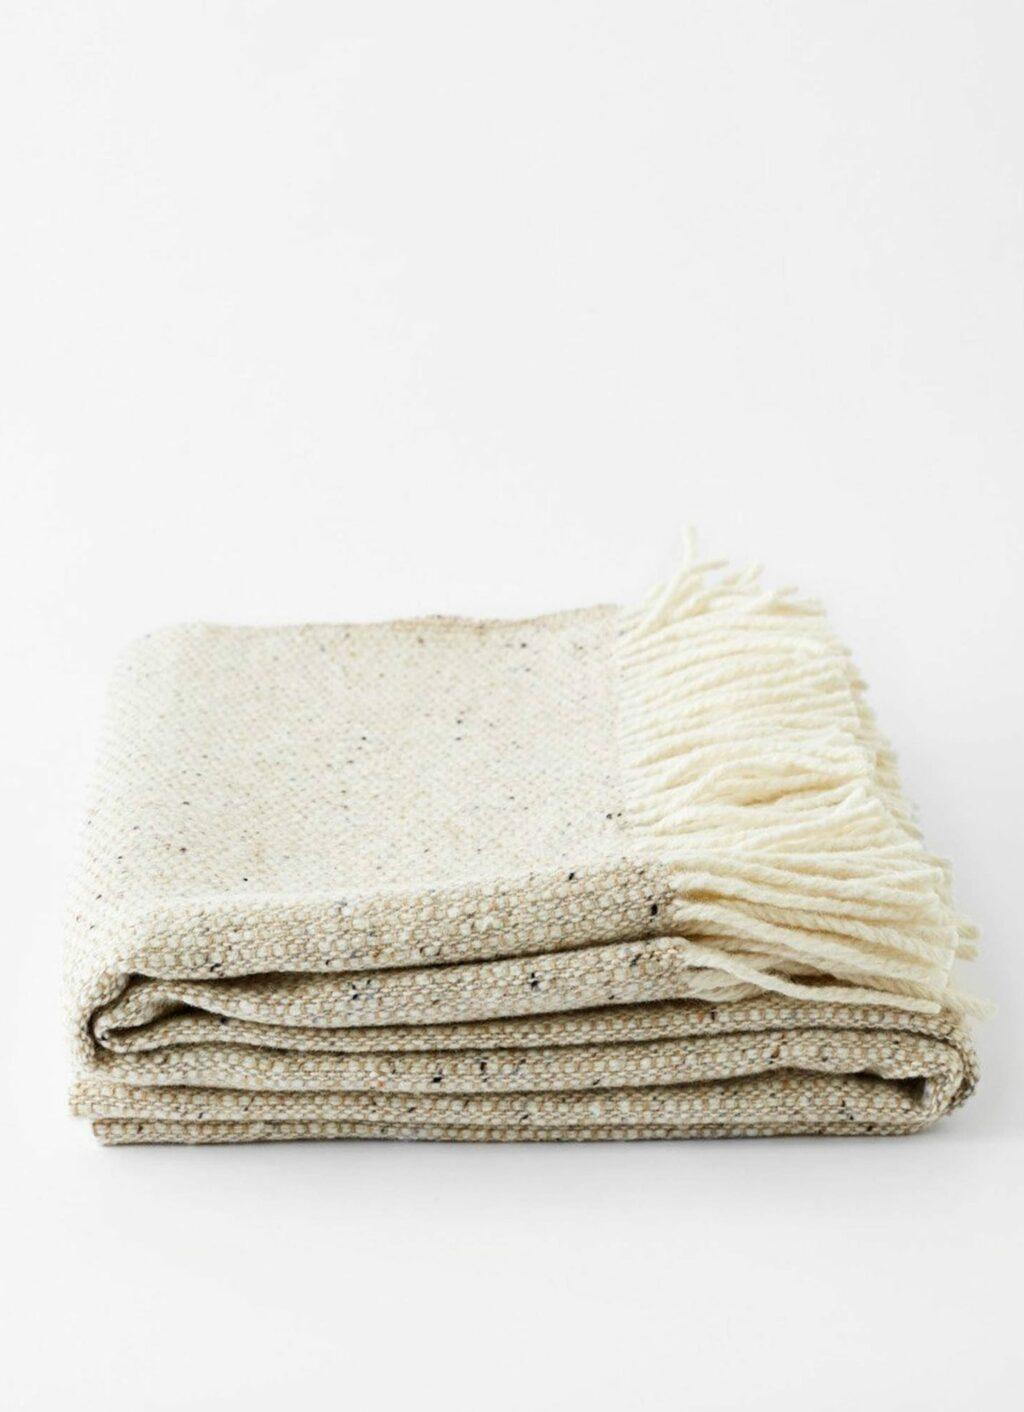 Mourne Textiles - Tweed Emphasize - Merino Blanket - Oatmeal